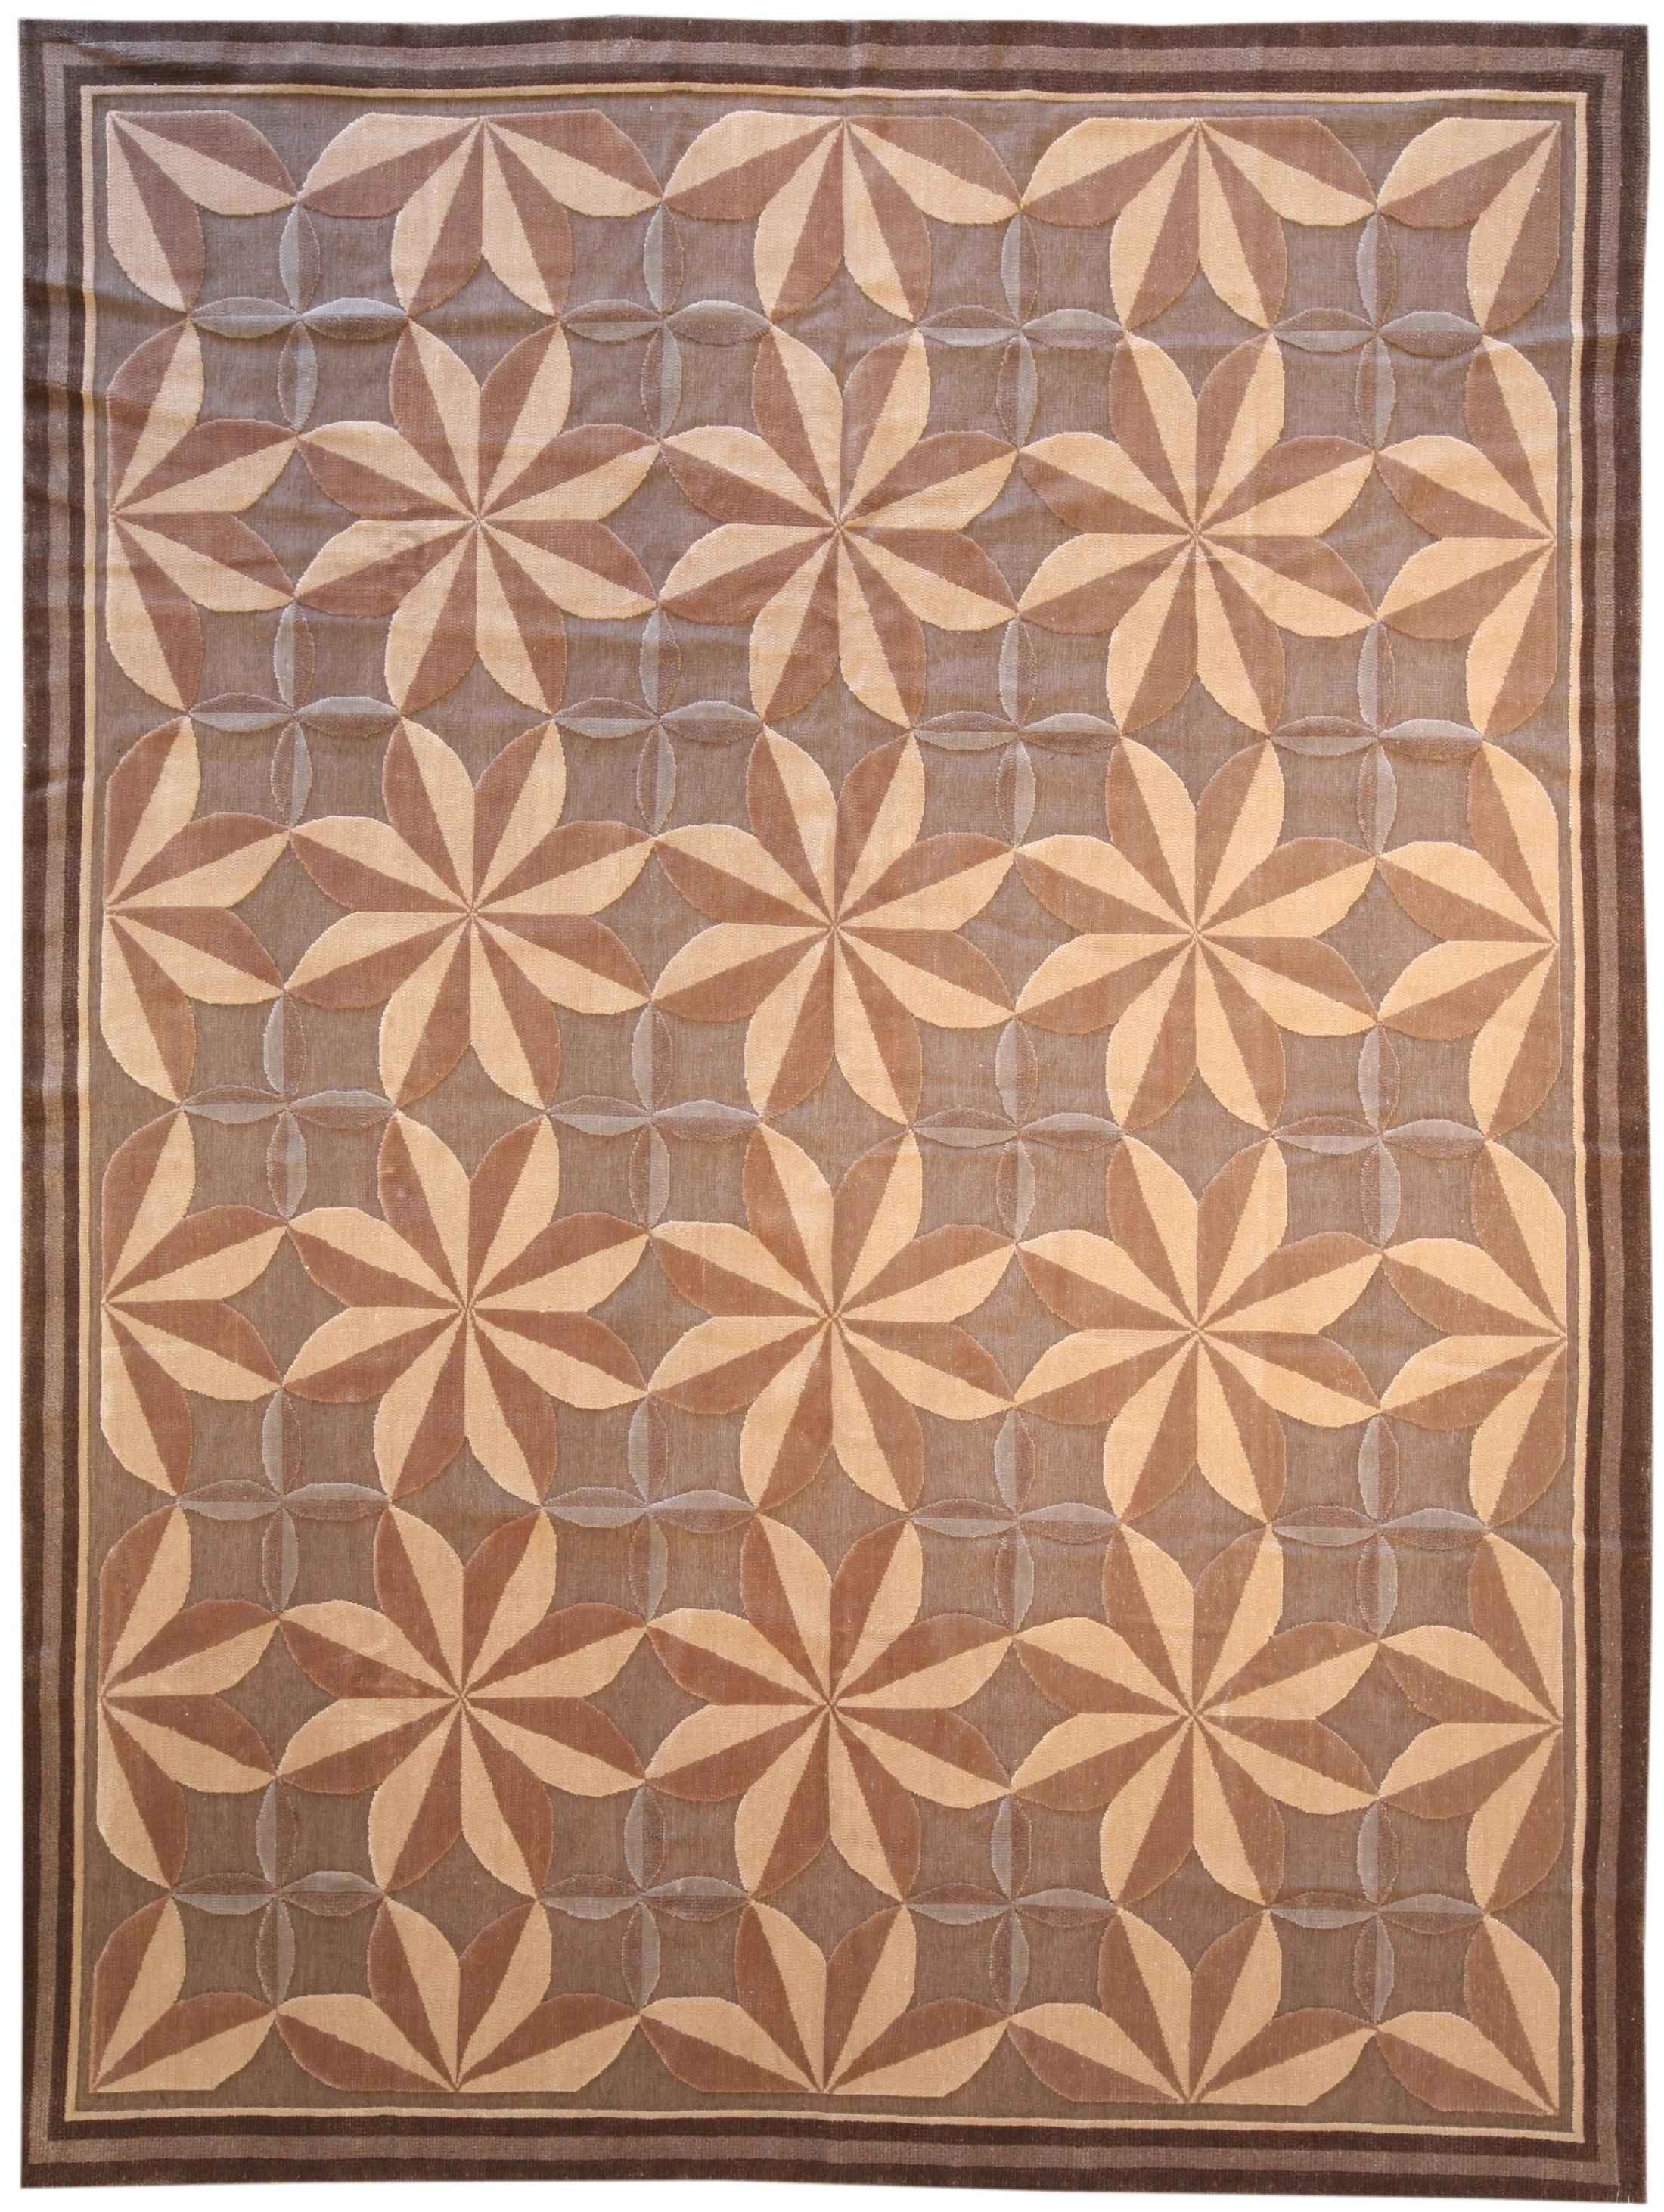 rug antique nazmiyal detail french large optimal ivory oversized aubusson carpet view rugs